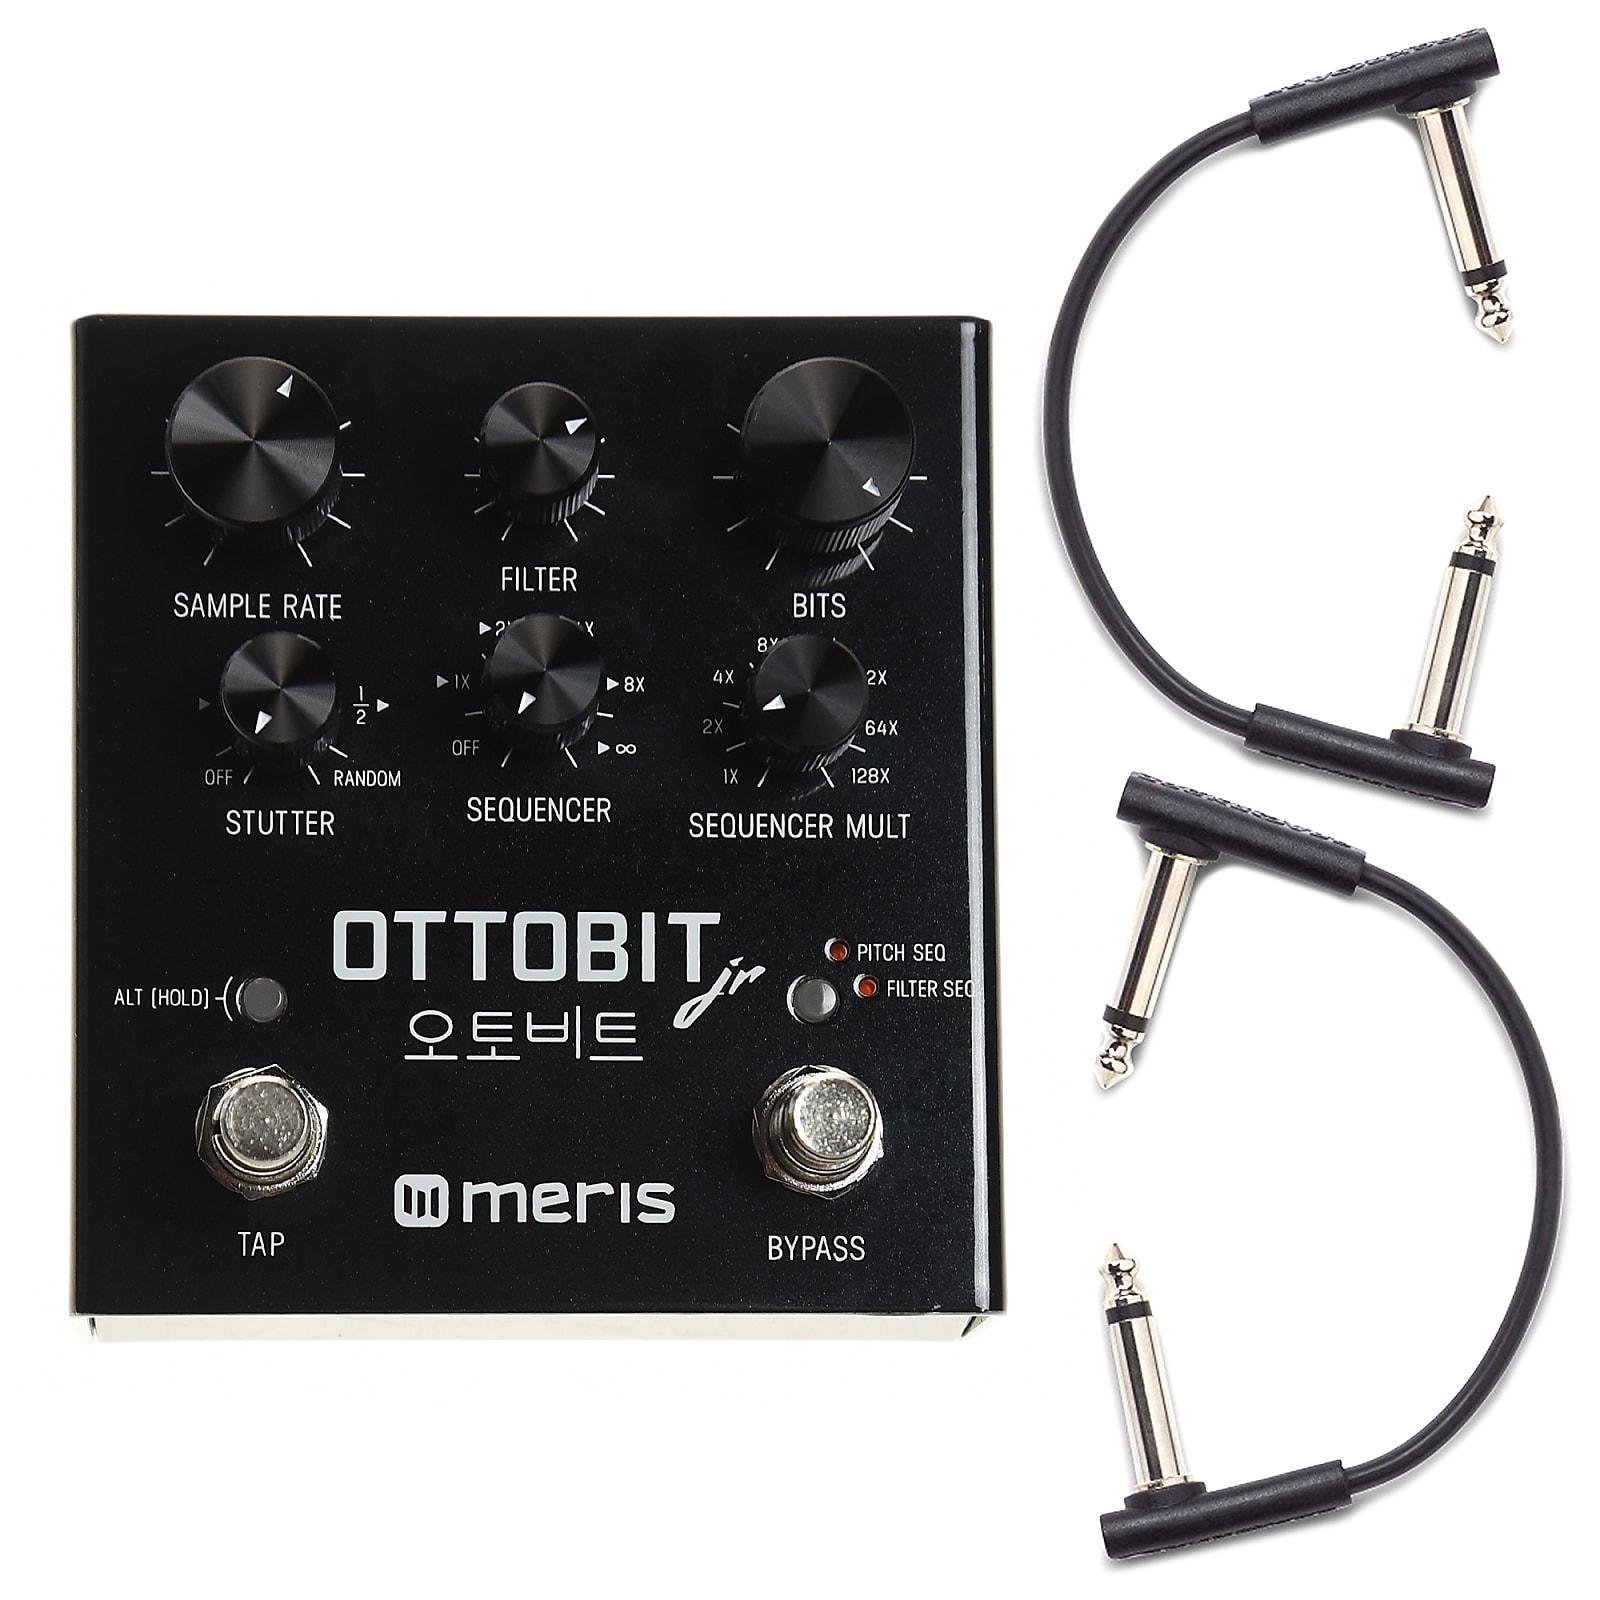 Meris Ottobit Jr. Bitcrusher Pedal w/RockBoard Flat Patch Cables Bundle